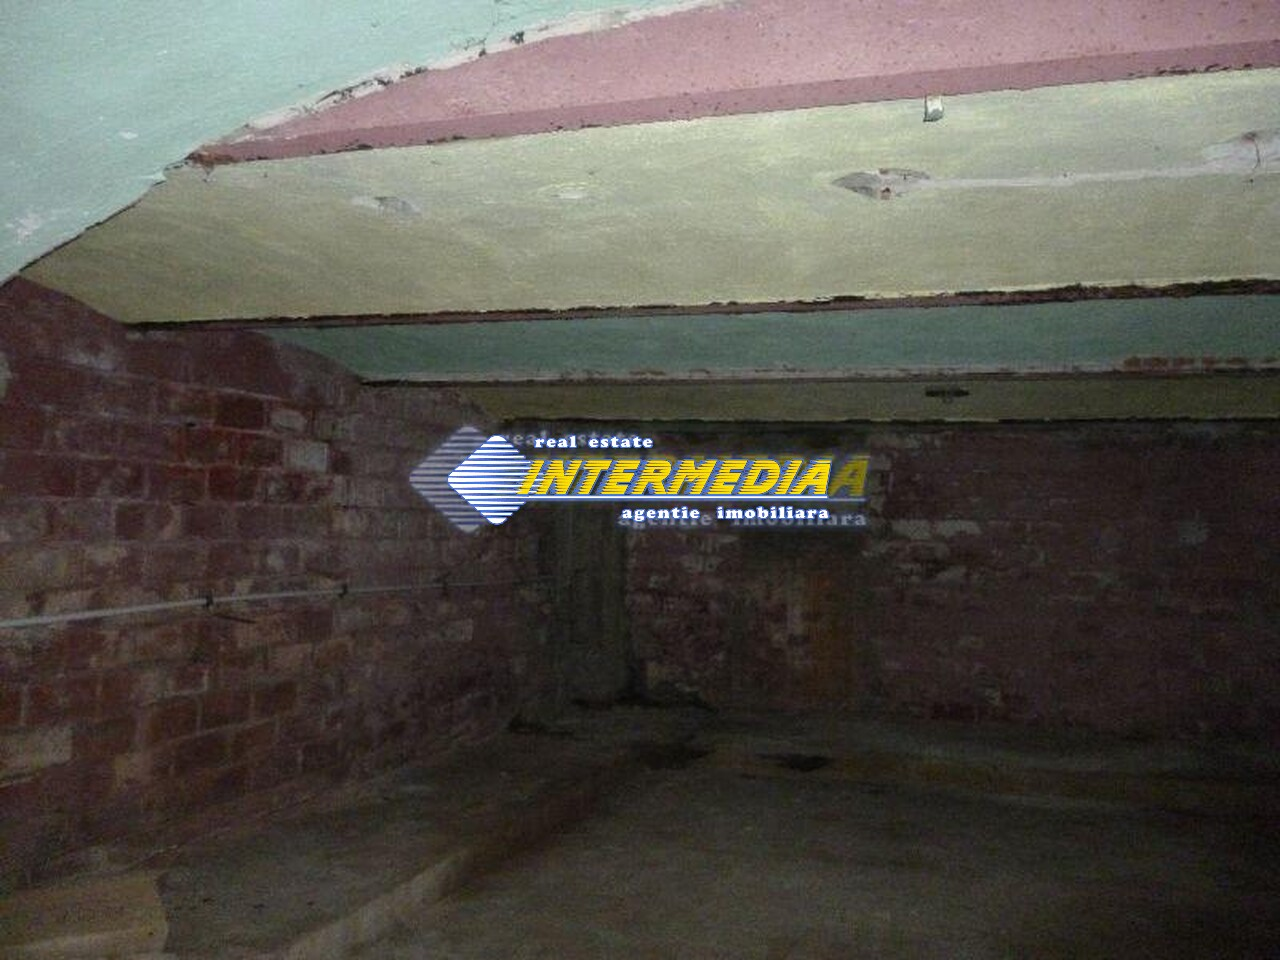 Spatiu Comercial de inchiriat Centru 60 mp-17232-3